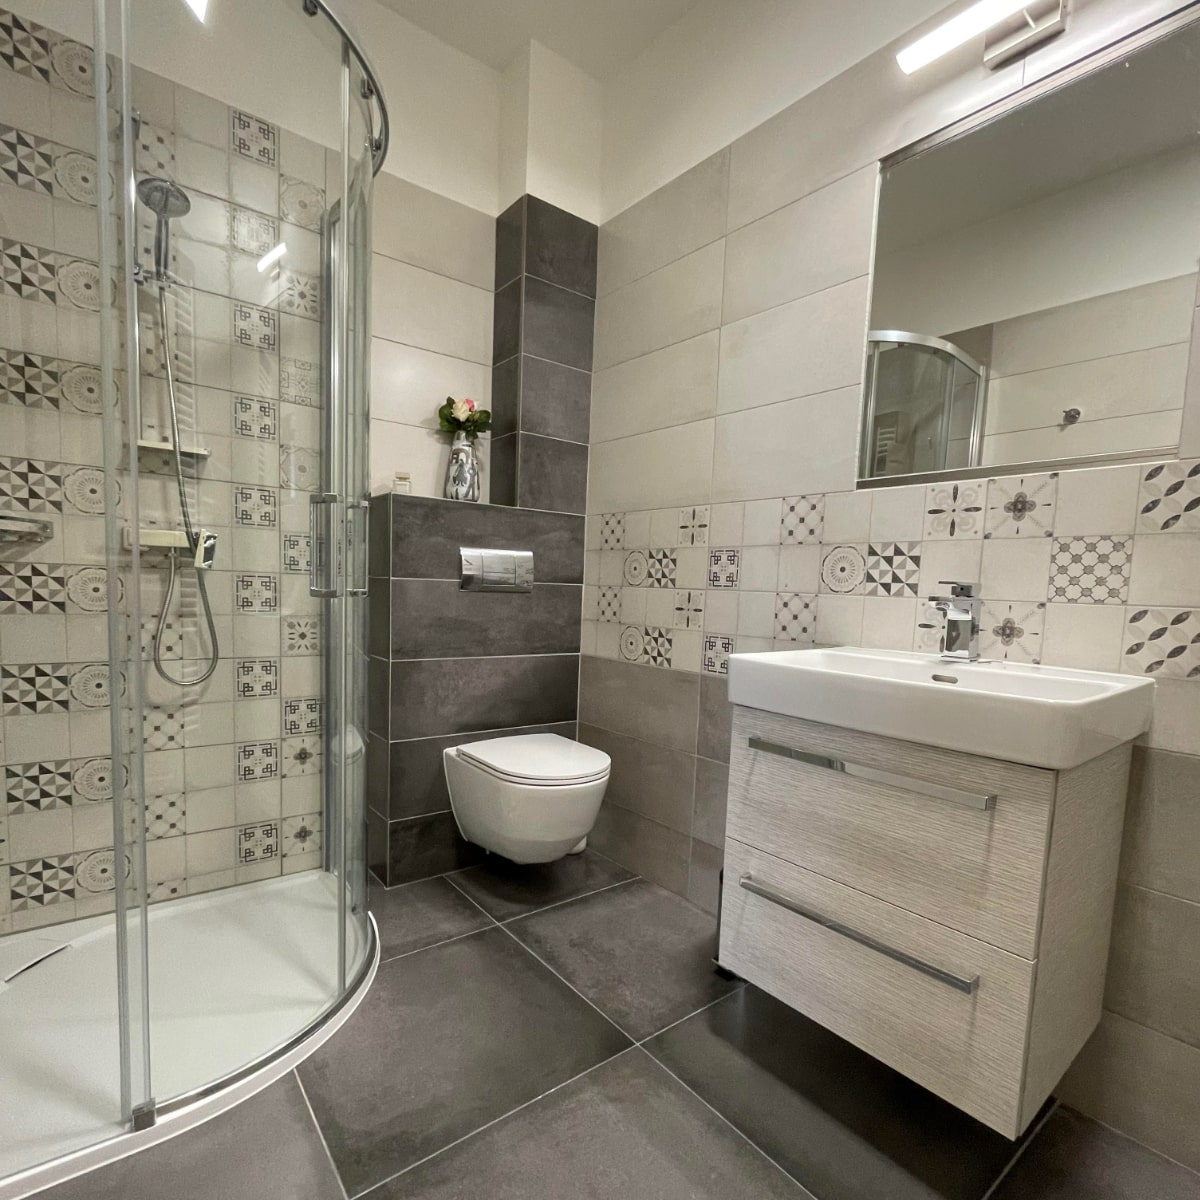 Apartmán Couple - koupelna se sprchou